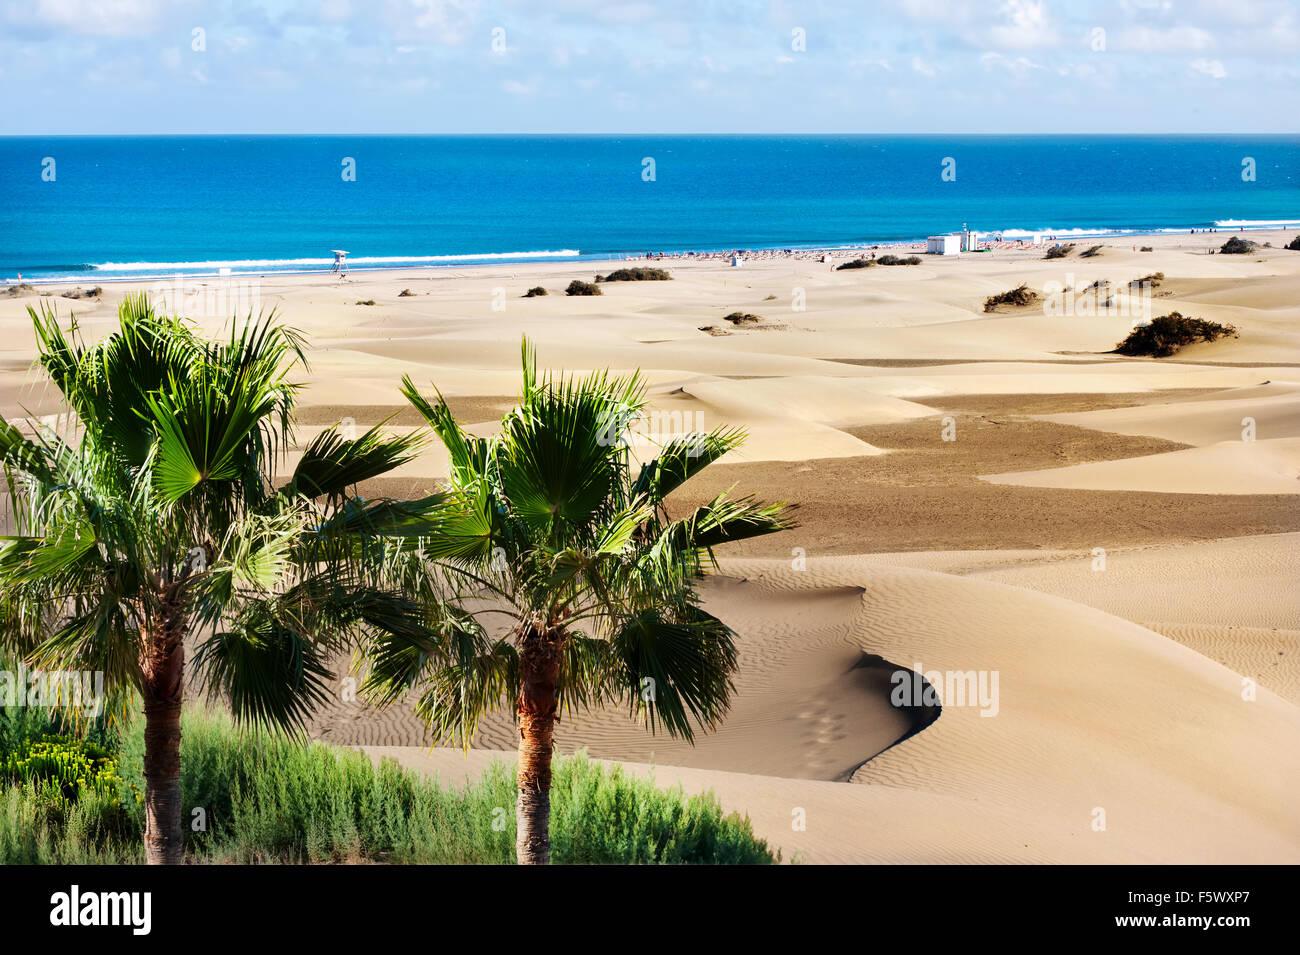 Dünen von Maspalomas. Gran Canaria. Kanarischen Inseln. Stockbild